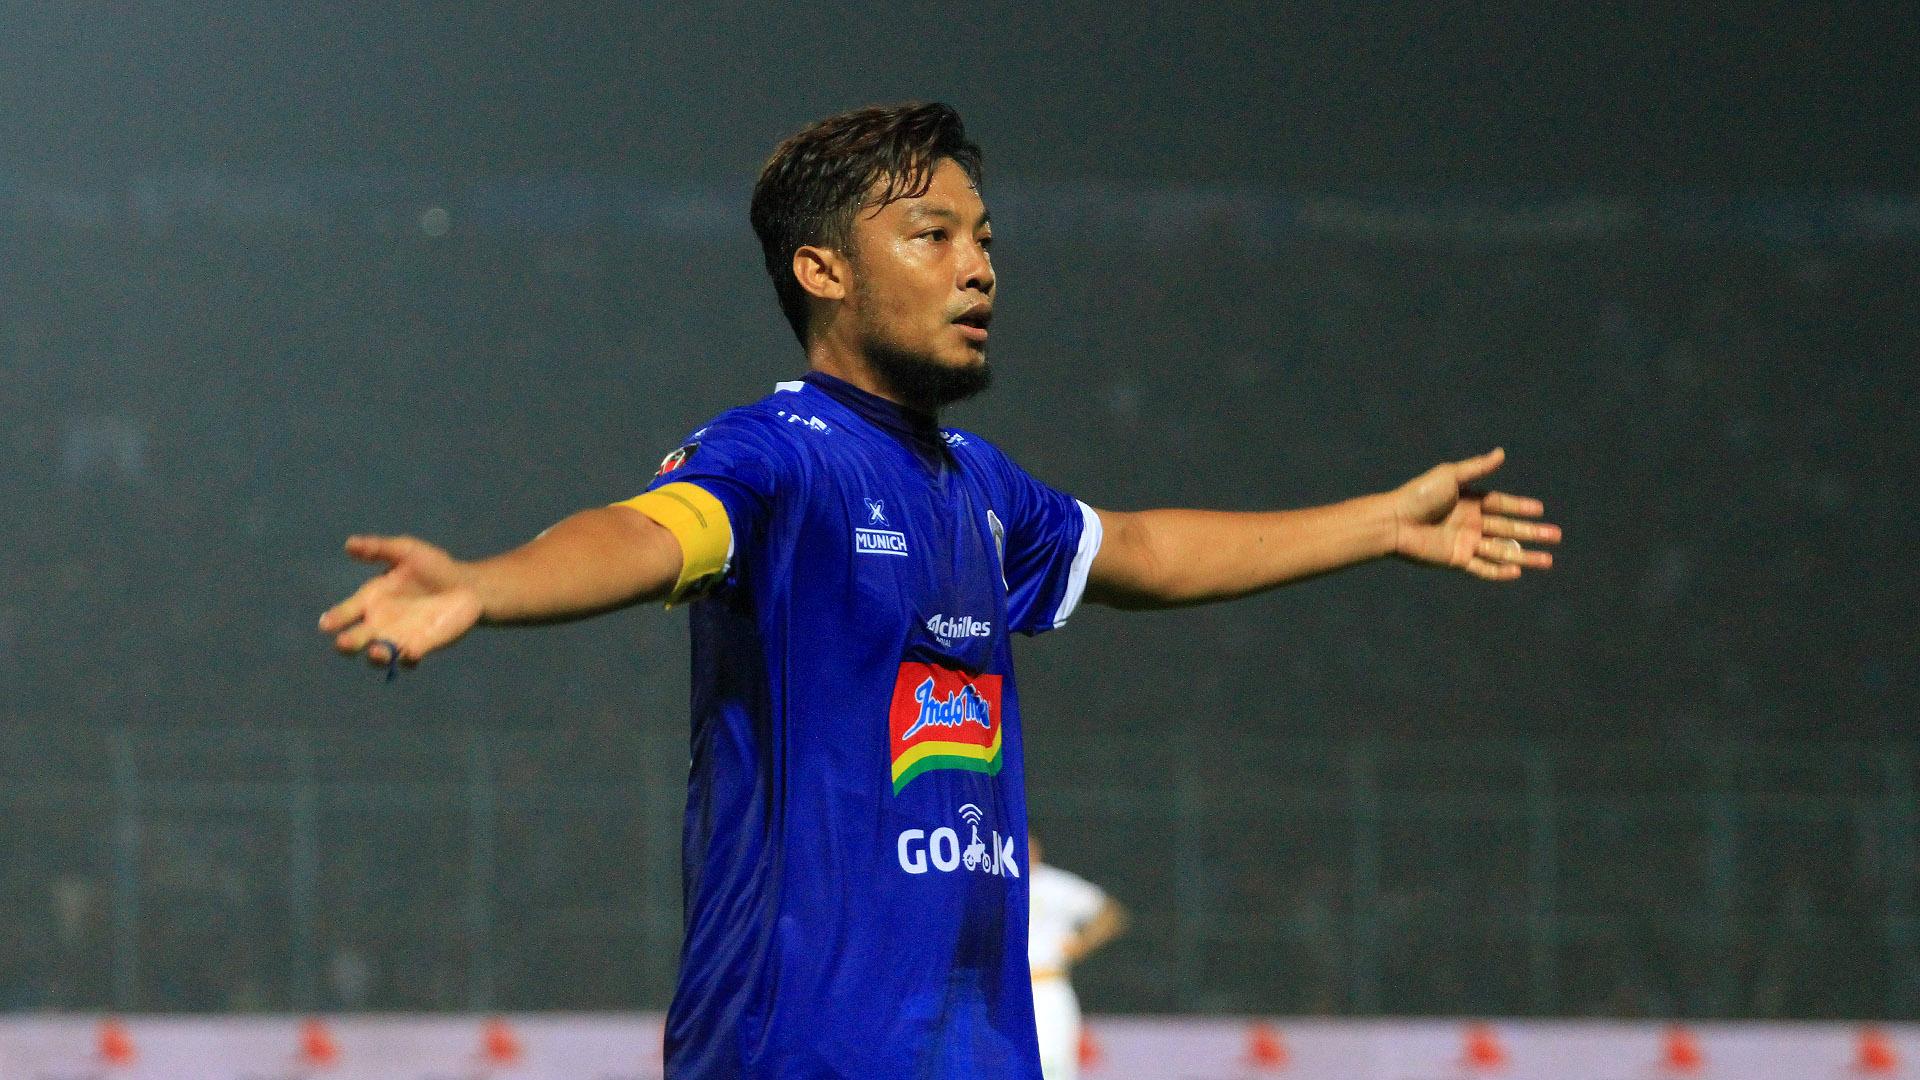 Hamka Hamzah Arema FC - Piala Presiden 2019